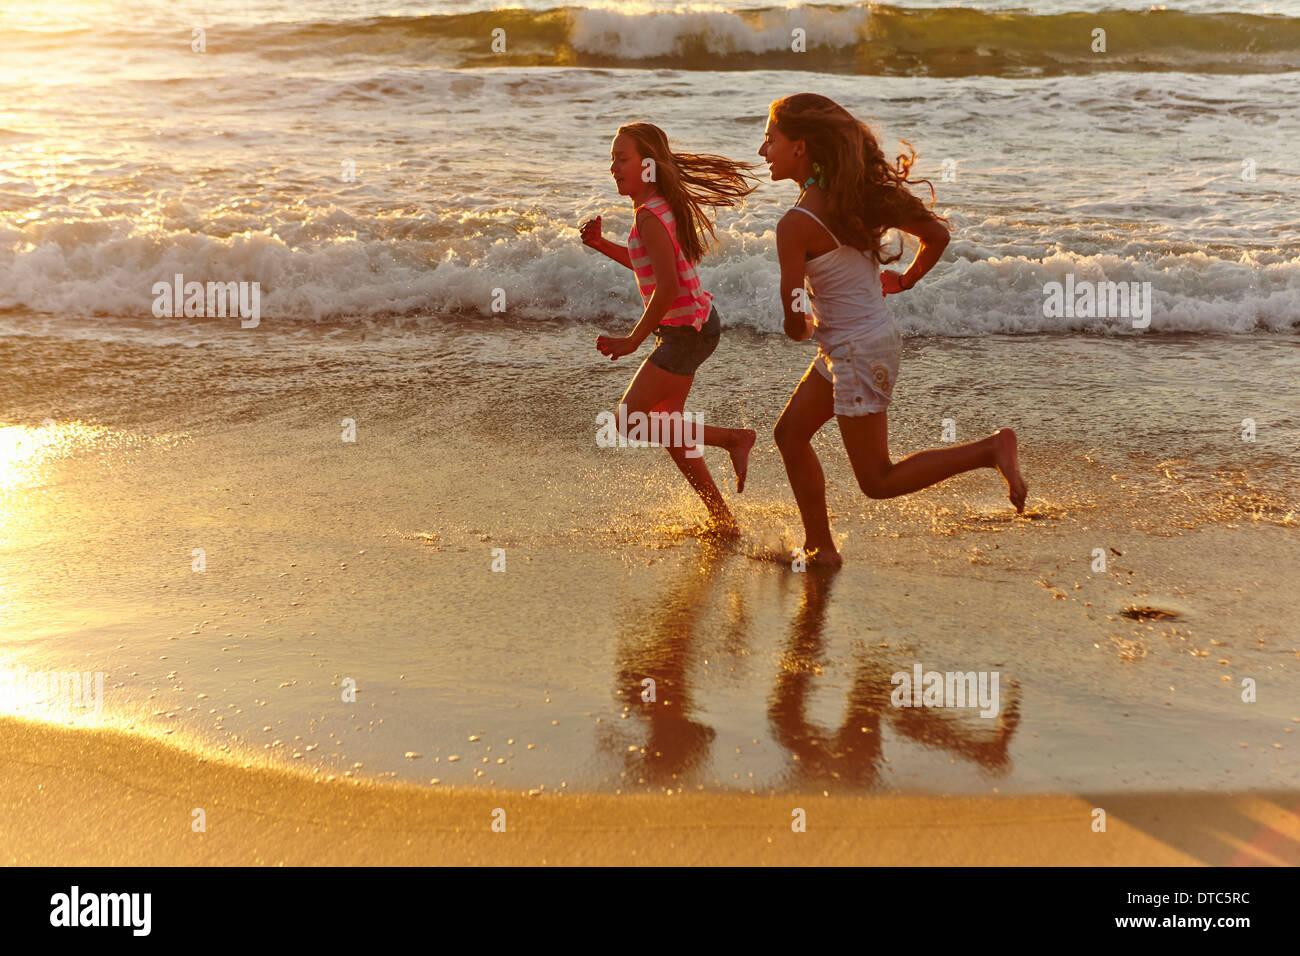 Two girls running along beach at sunset - Stock Image